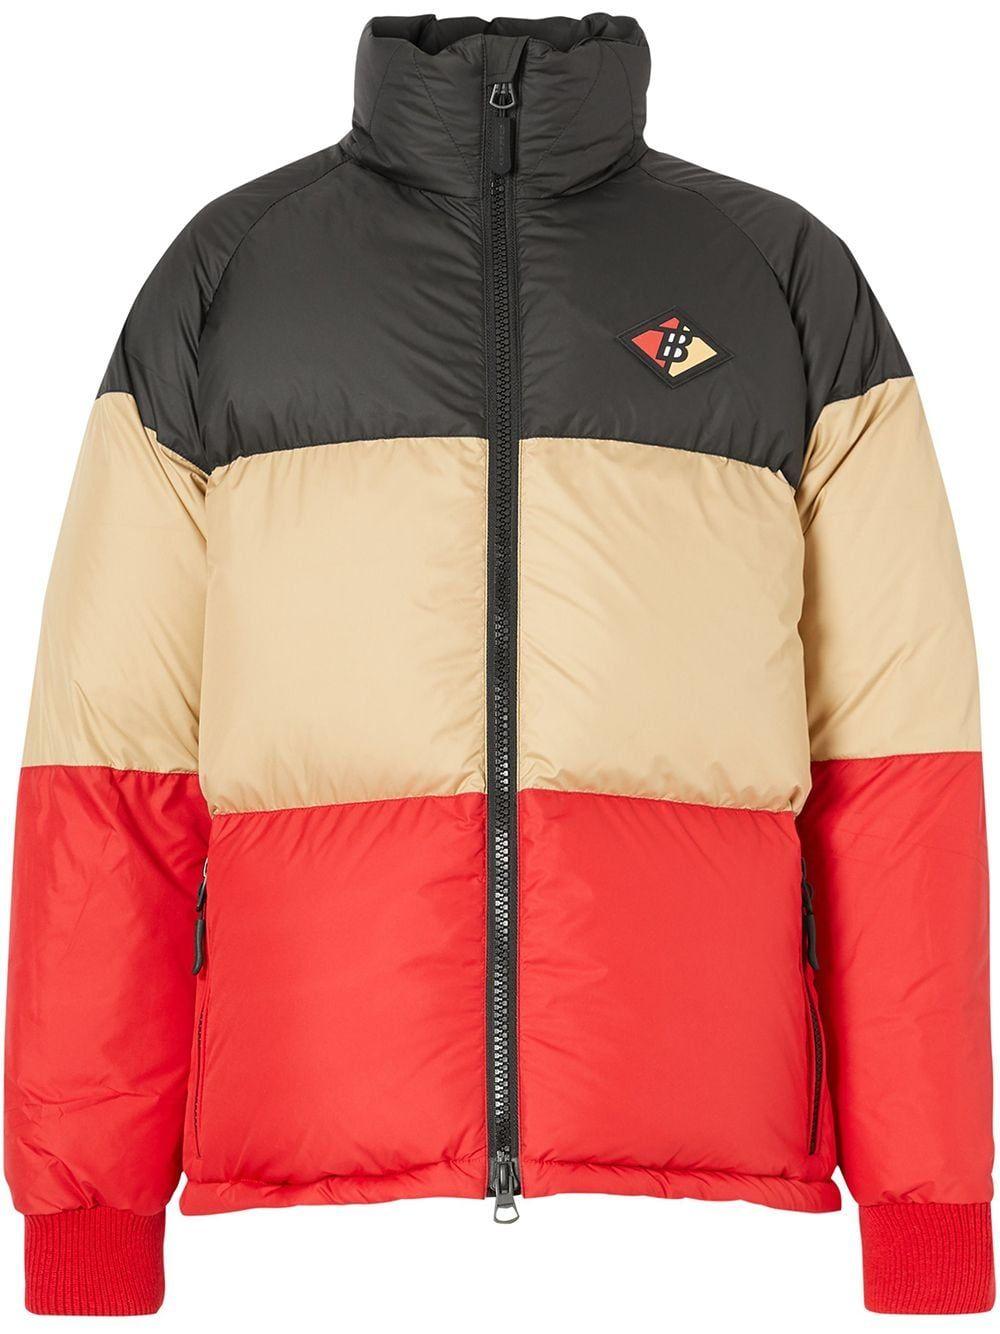 Burberry Colour Block Logo Patch Puffer Jacket Farfetch Puffer Jackets Patch Logo Designer Clothes For Men [ 1334 x 1000 Pixel ]